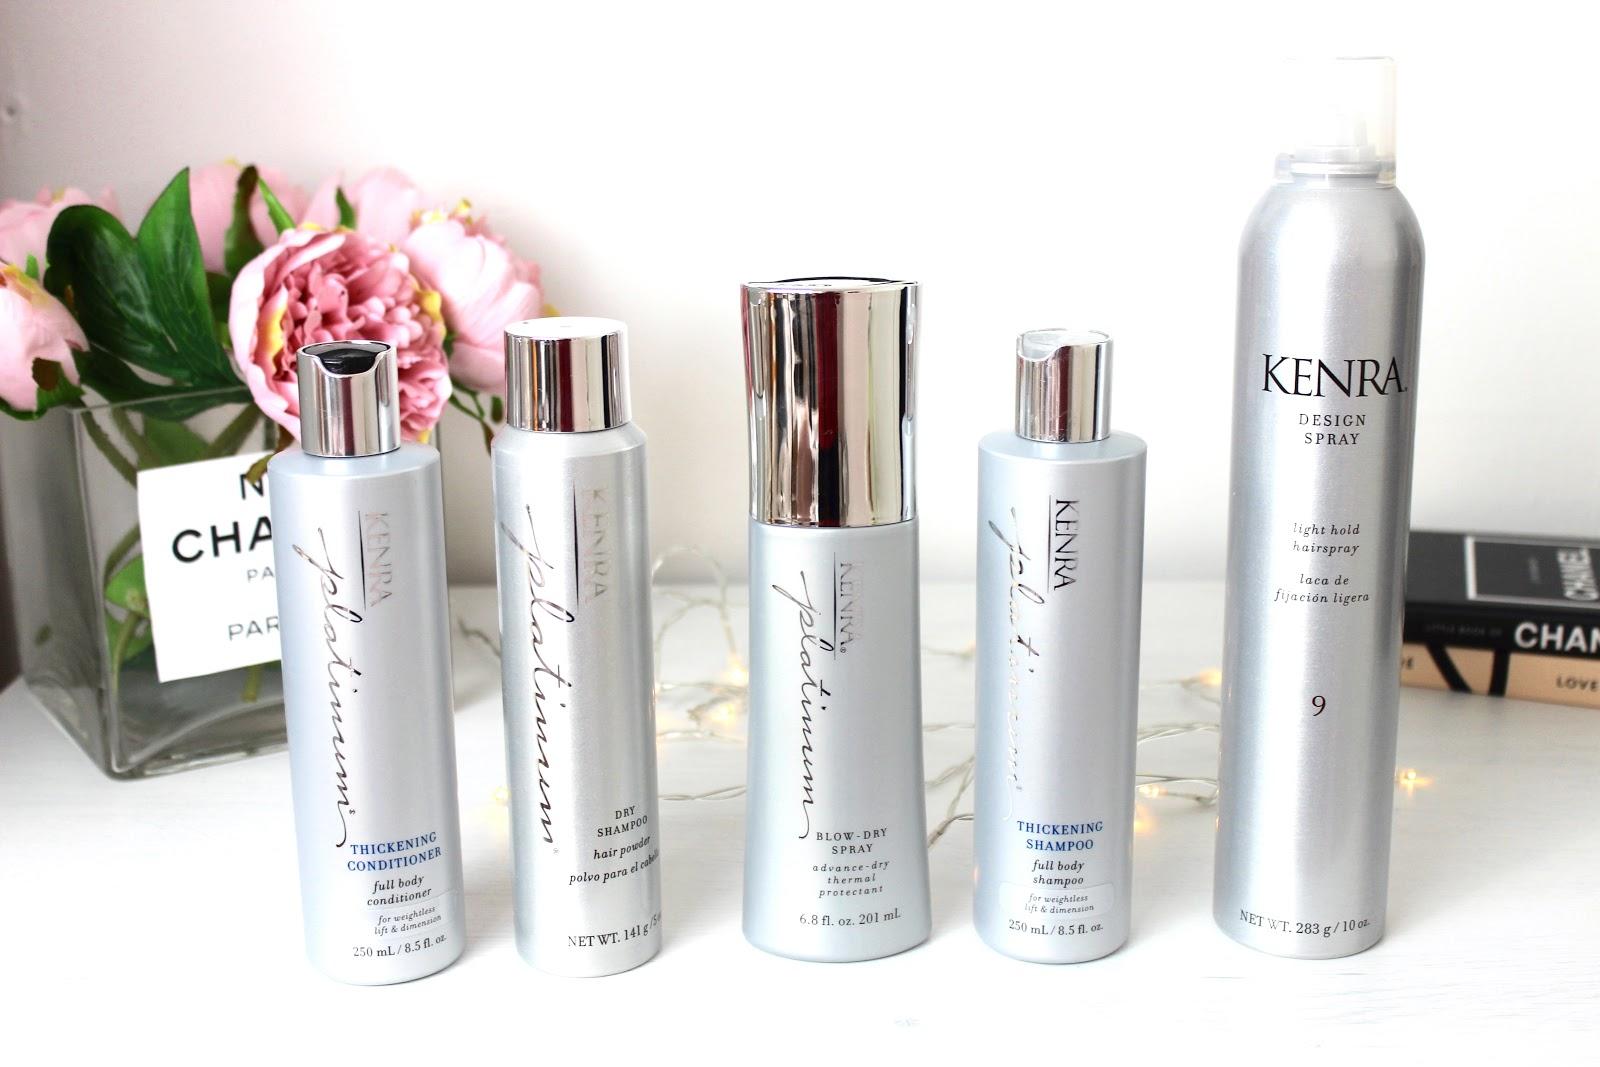 Kenra Haircare shampoo, conditioner dry shampoo